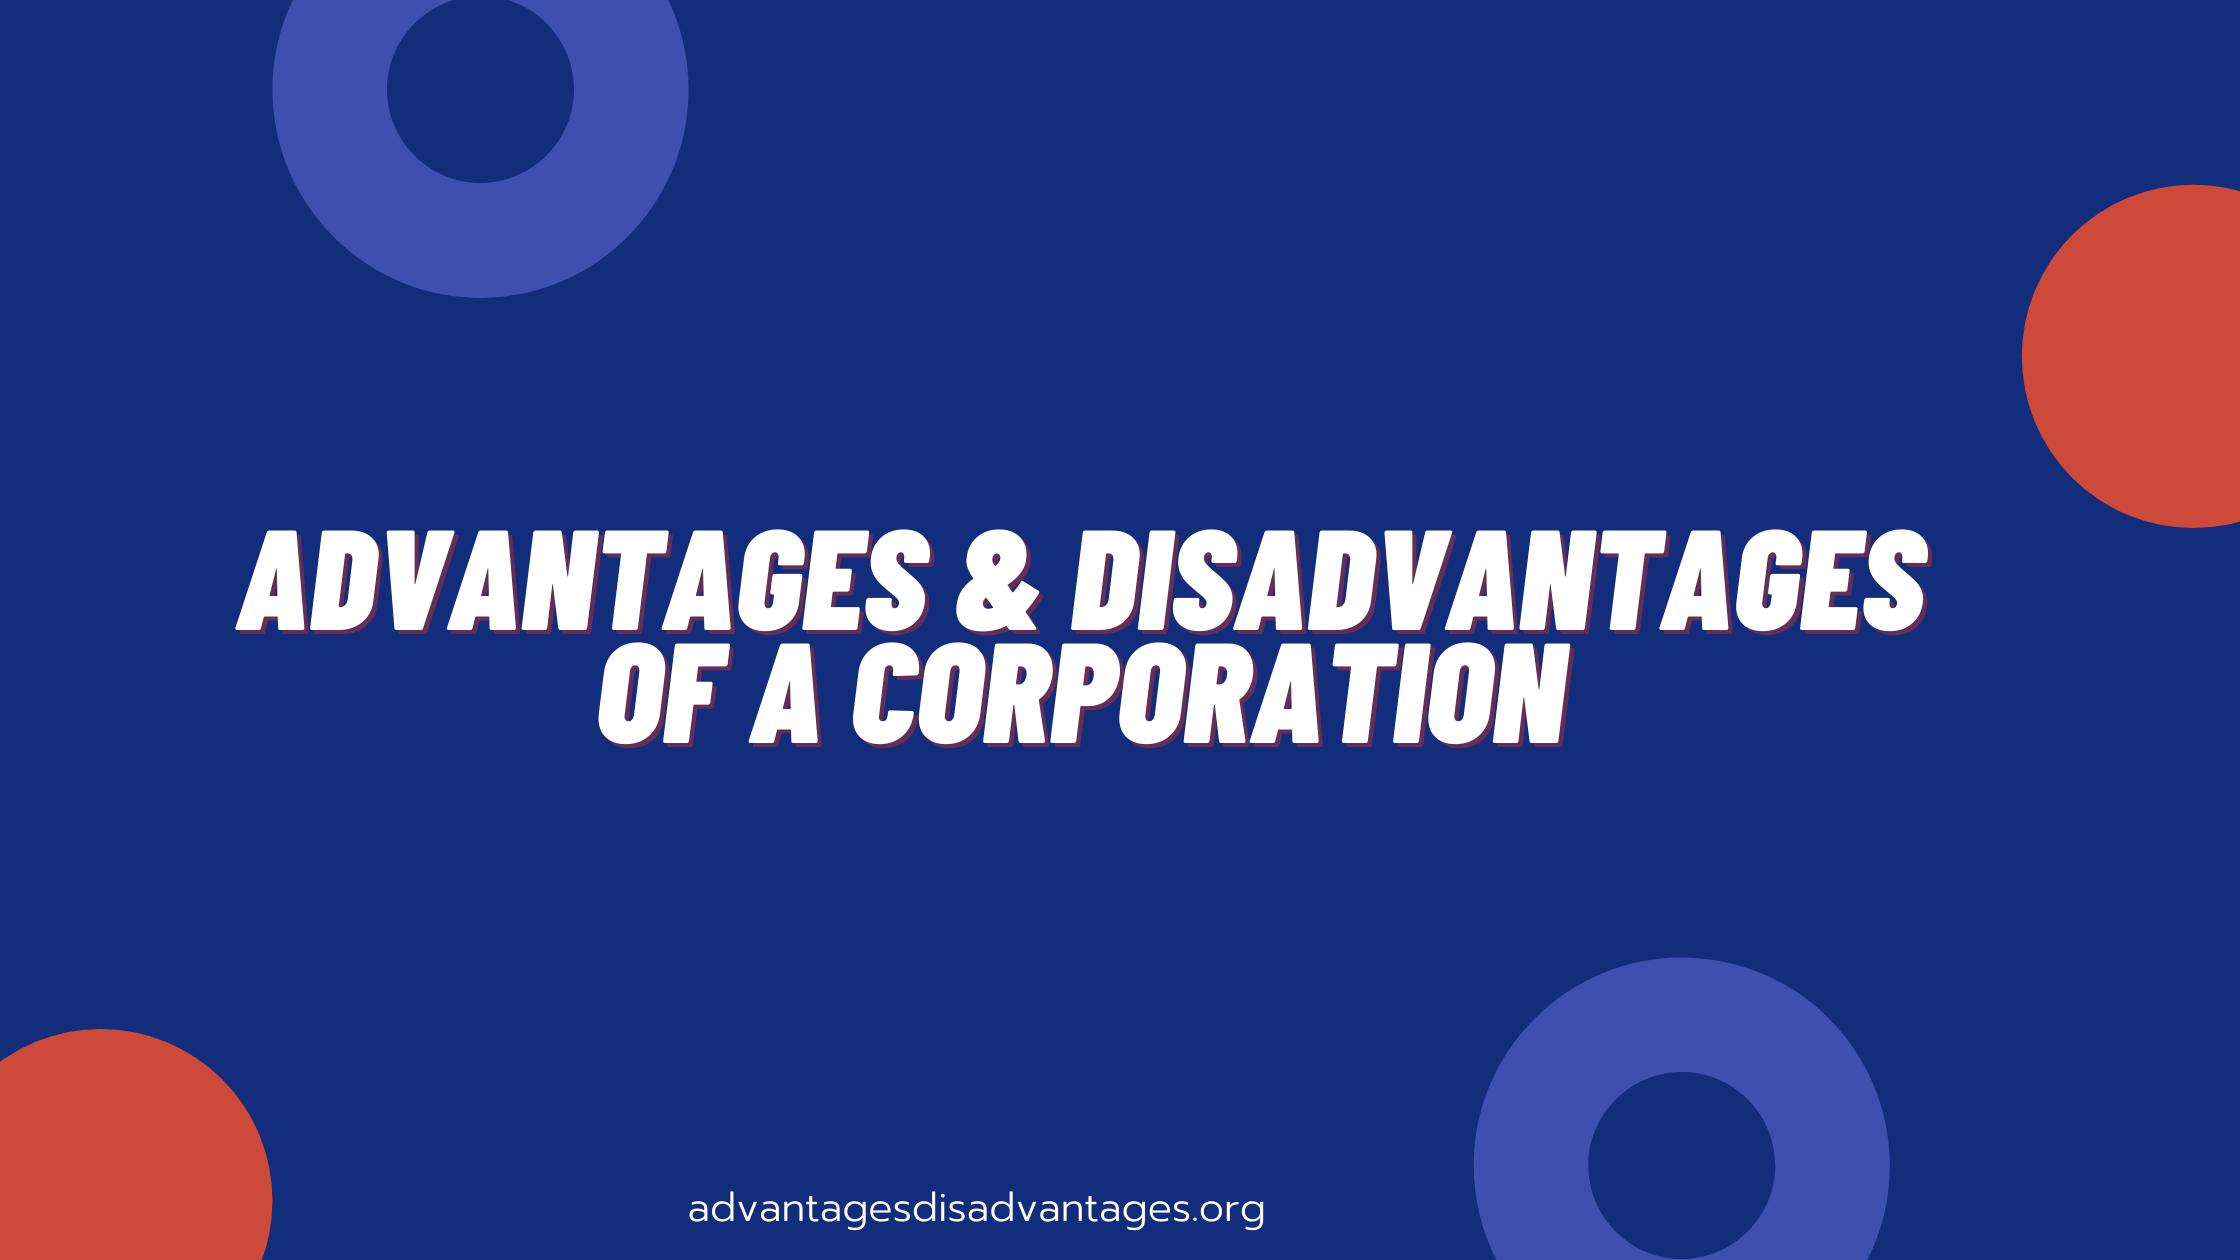 Advantages and Disadvantages of a Corporation